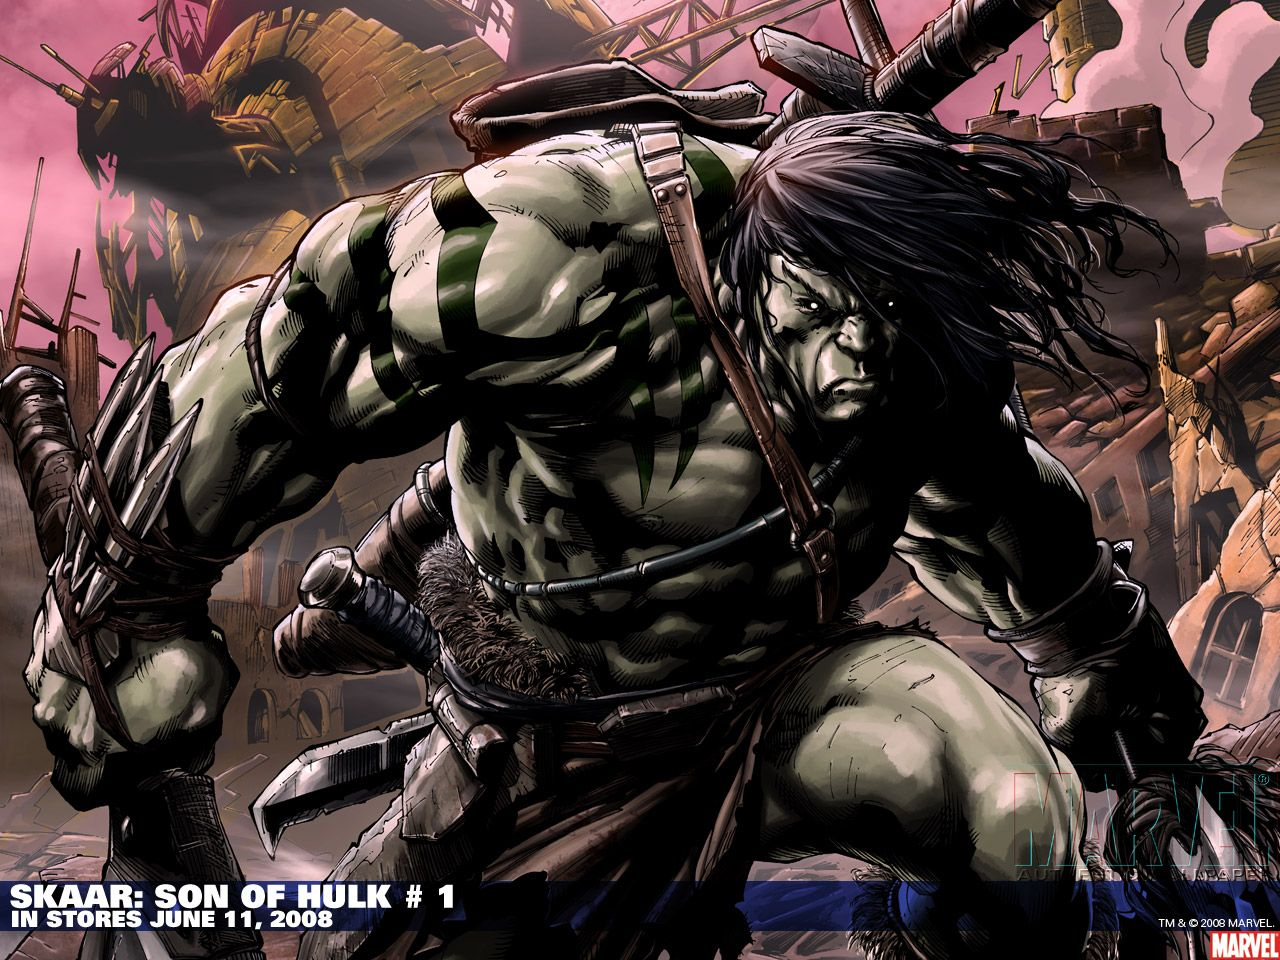 Hulk vs skaar - Google Search